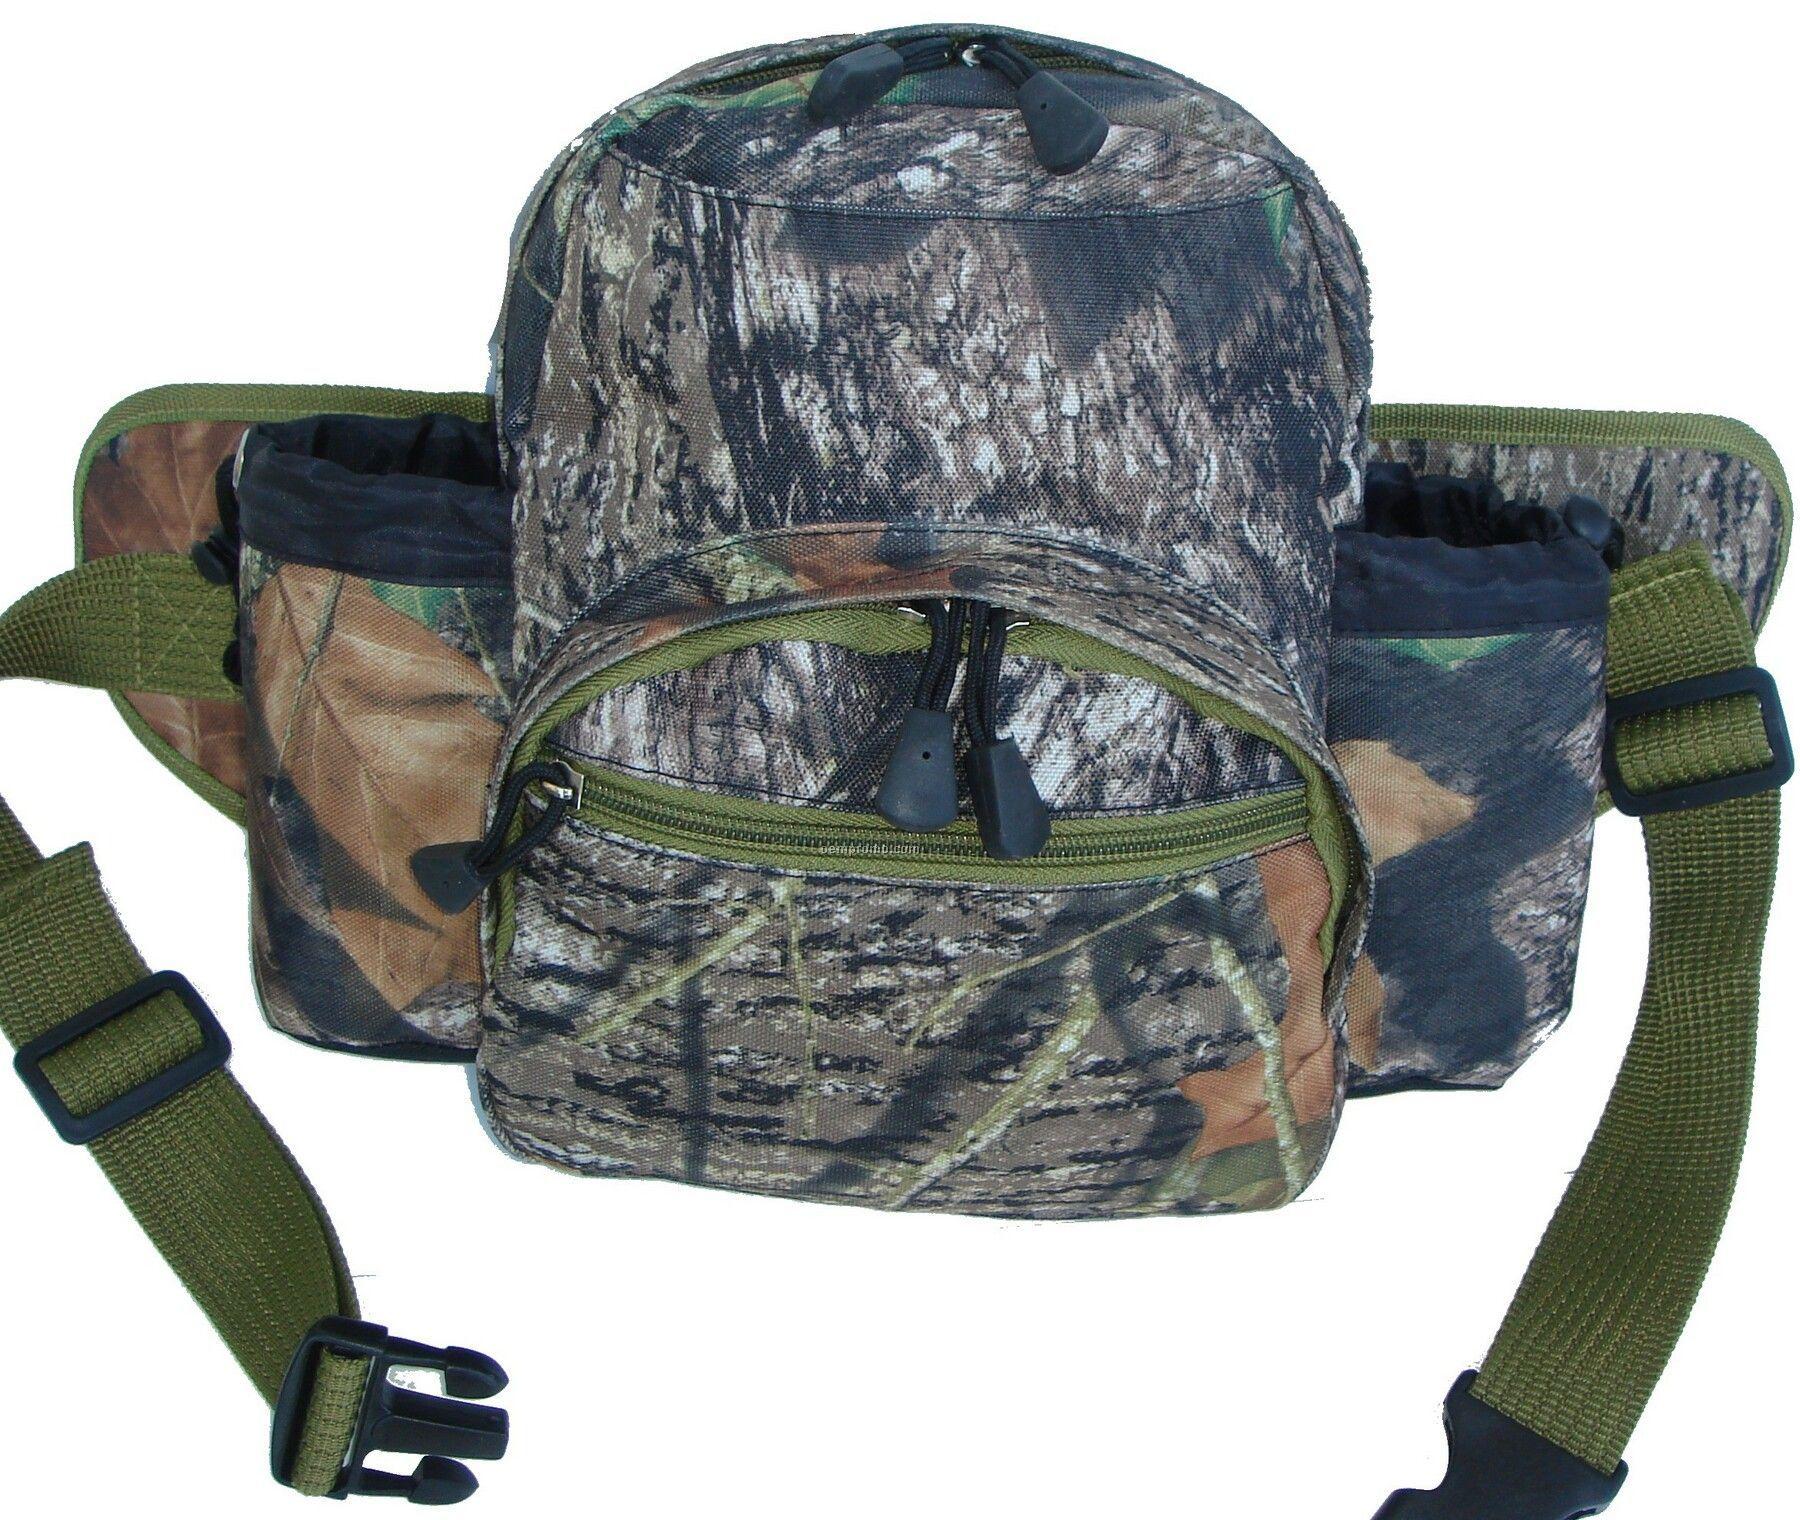 Mossy Oak Break Up Bottle Holder Bag